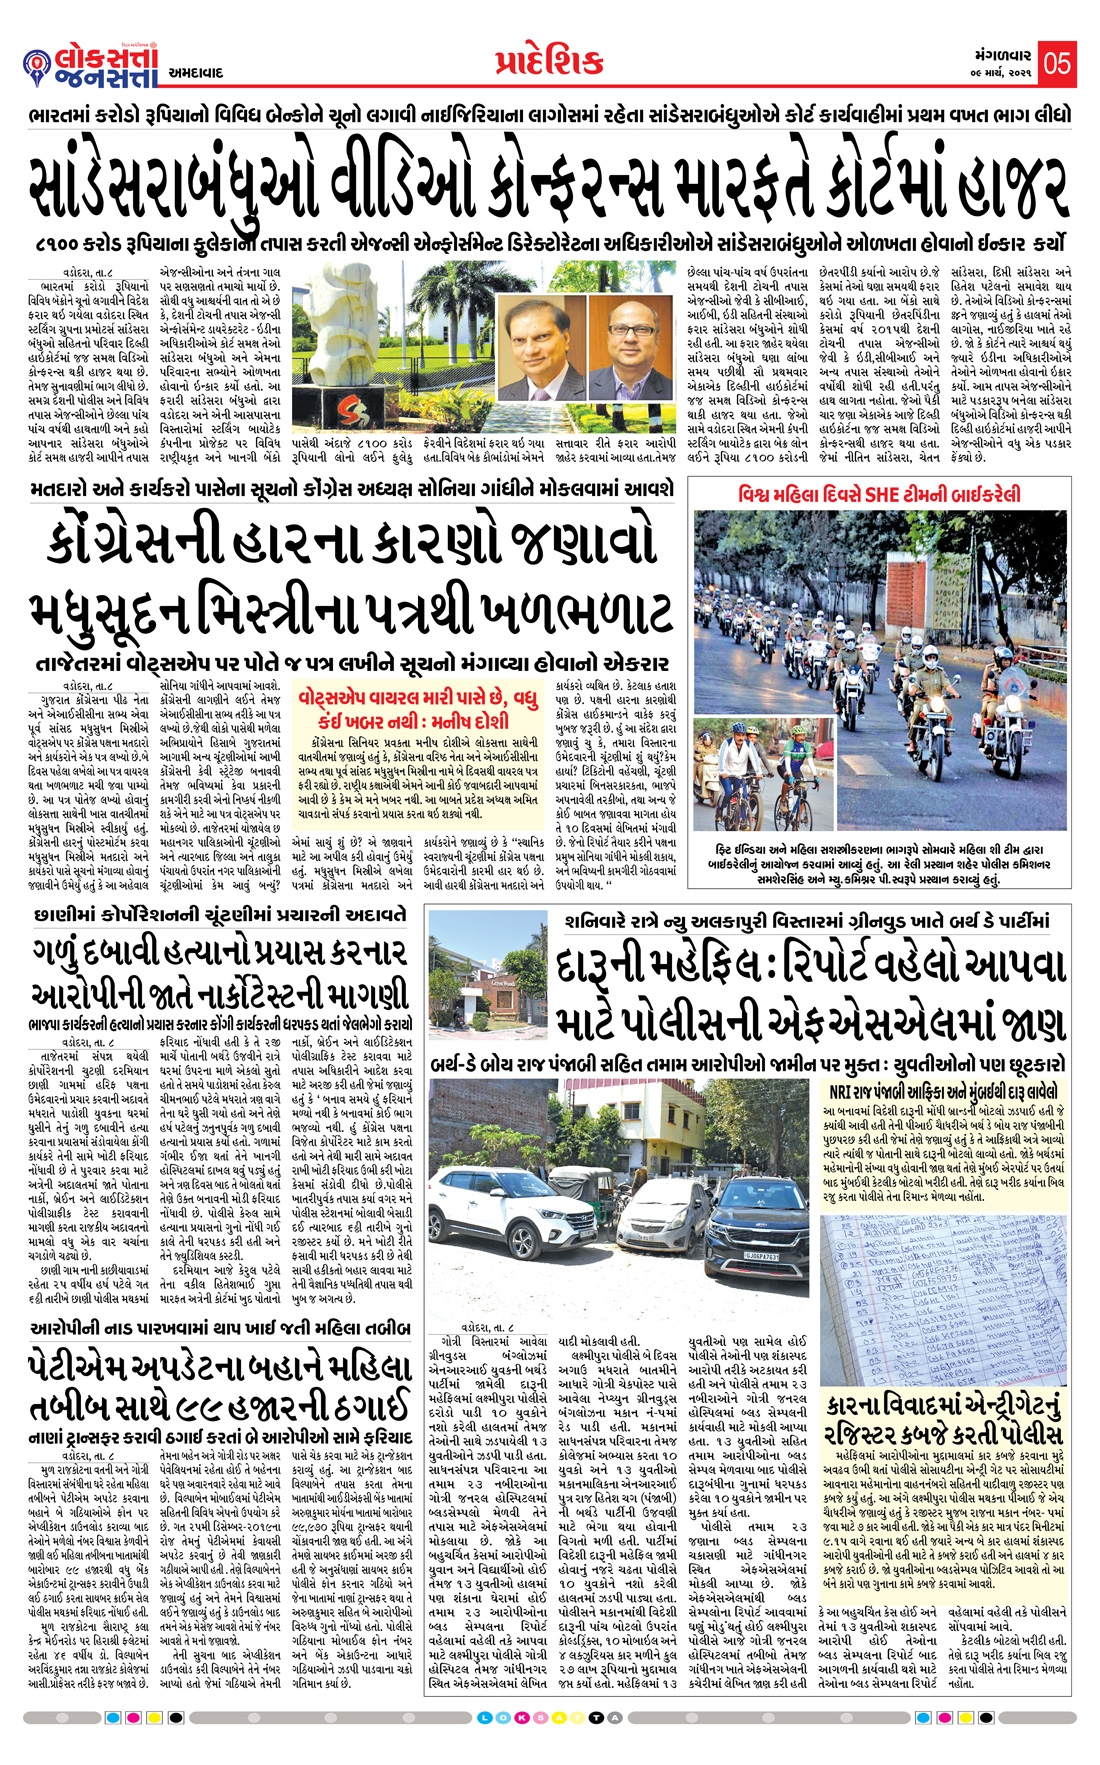 Loksatta Jansatta News Papaer E-paper dated 2021-03-09 | Page 6